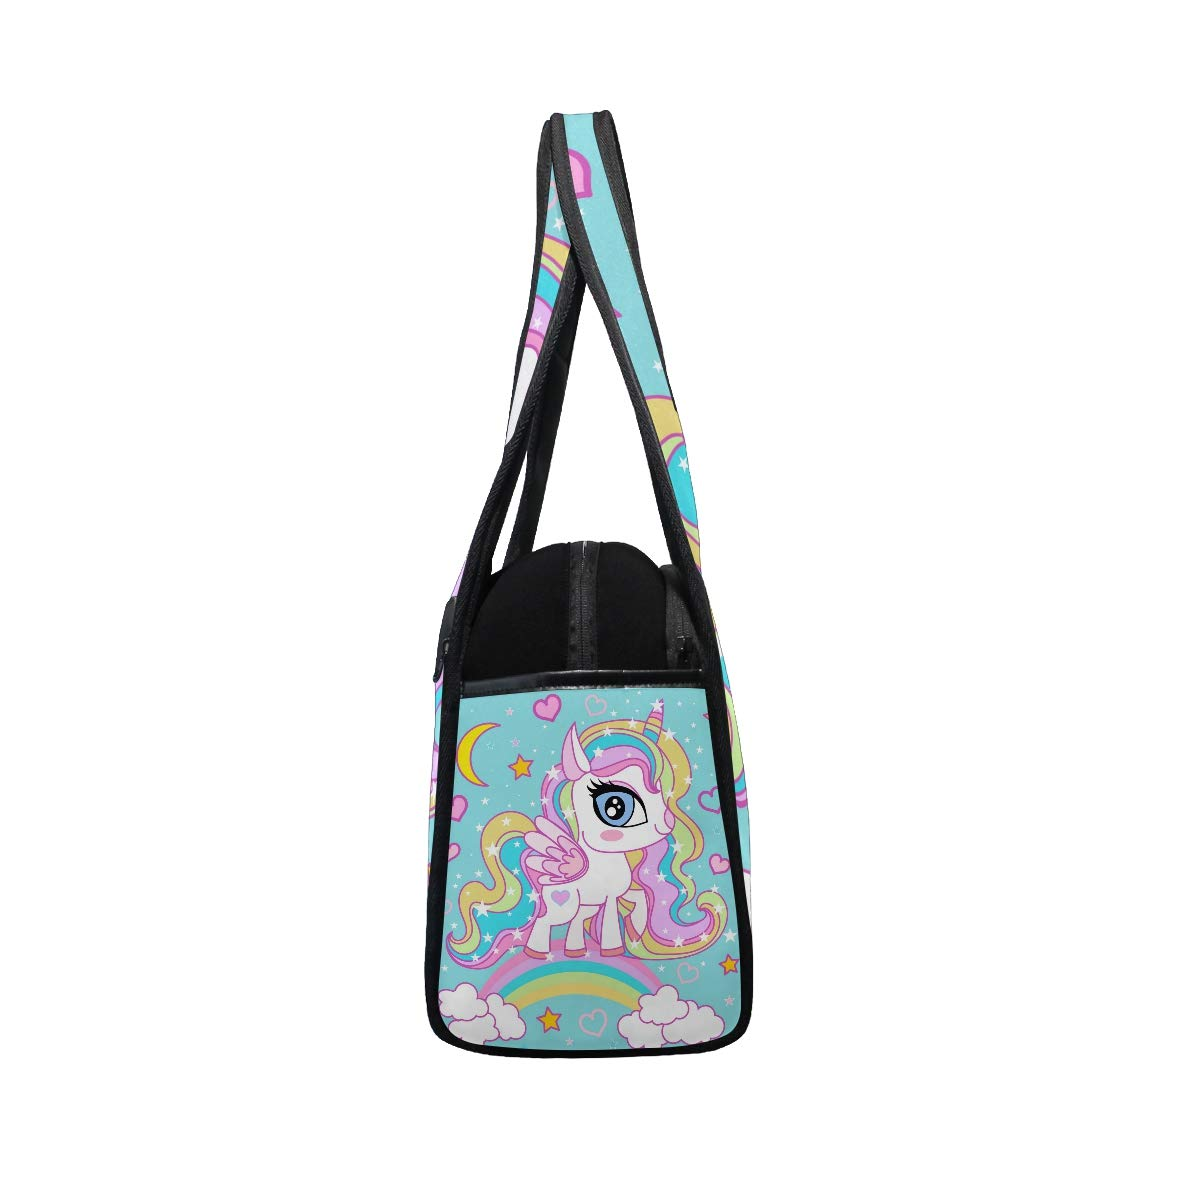 Gym Bag Sports Holdall Unicorn Rainbow Canvas Shoulder Bag Overnight Travel Bag for Men and Women